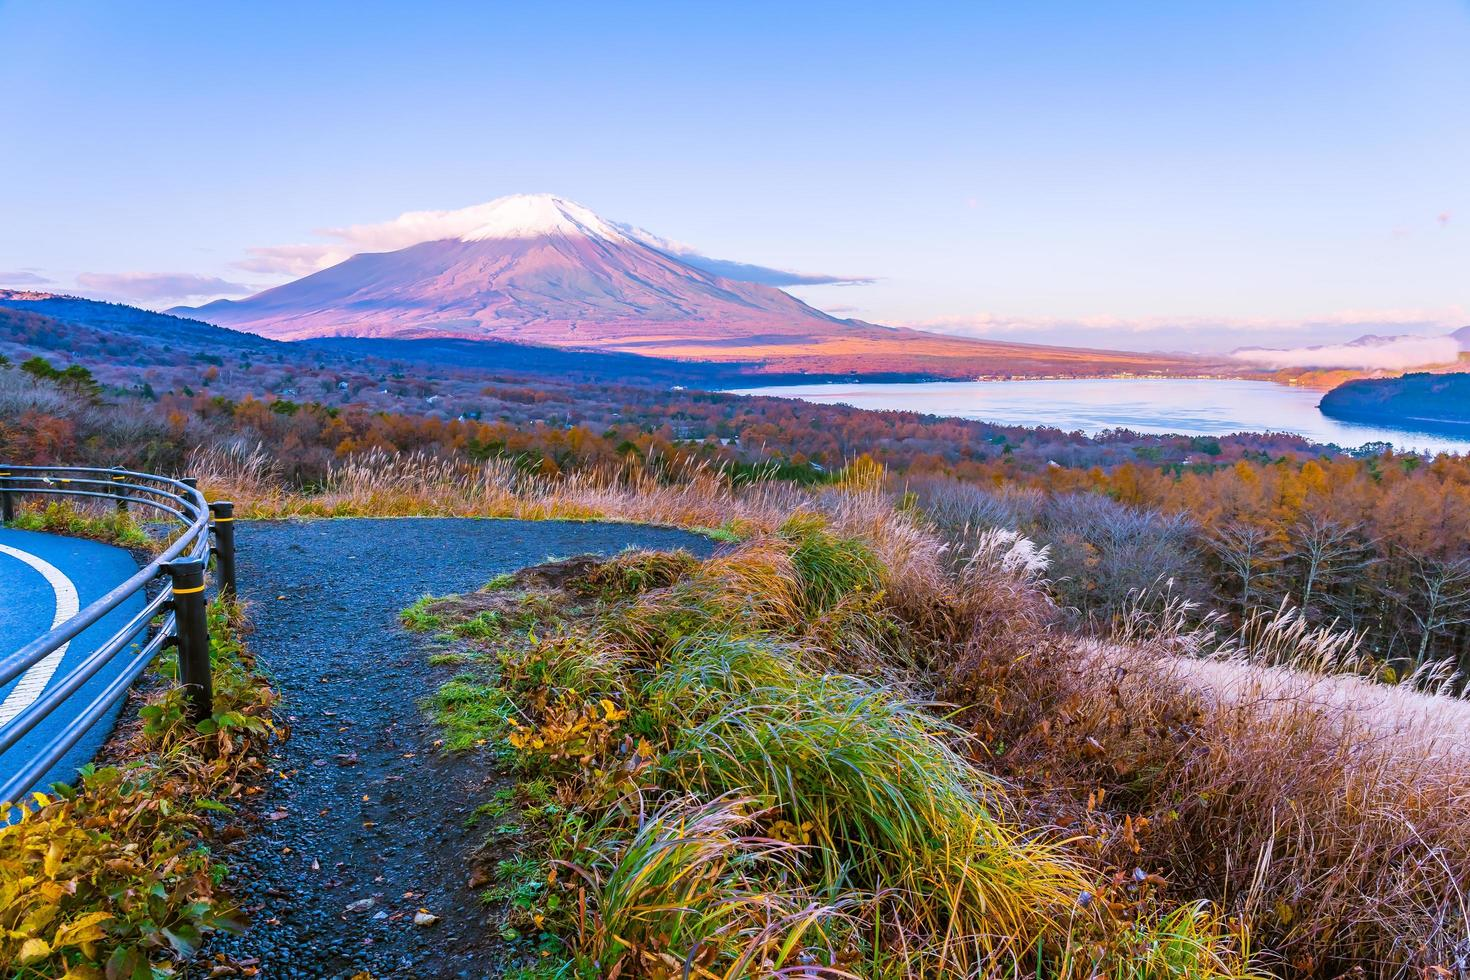 bella vista di mt. fuji al lago yamanakako, giappone foto